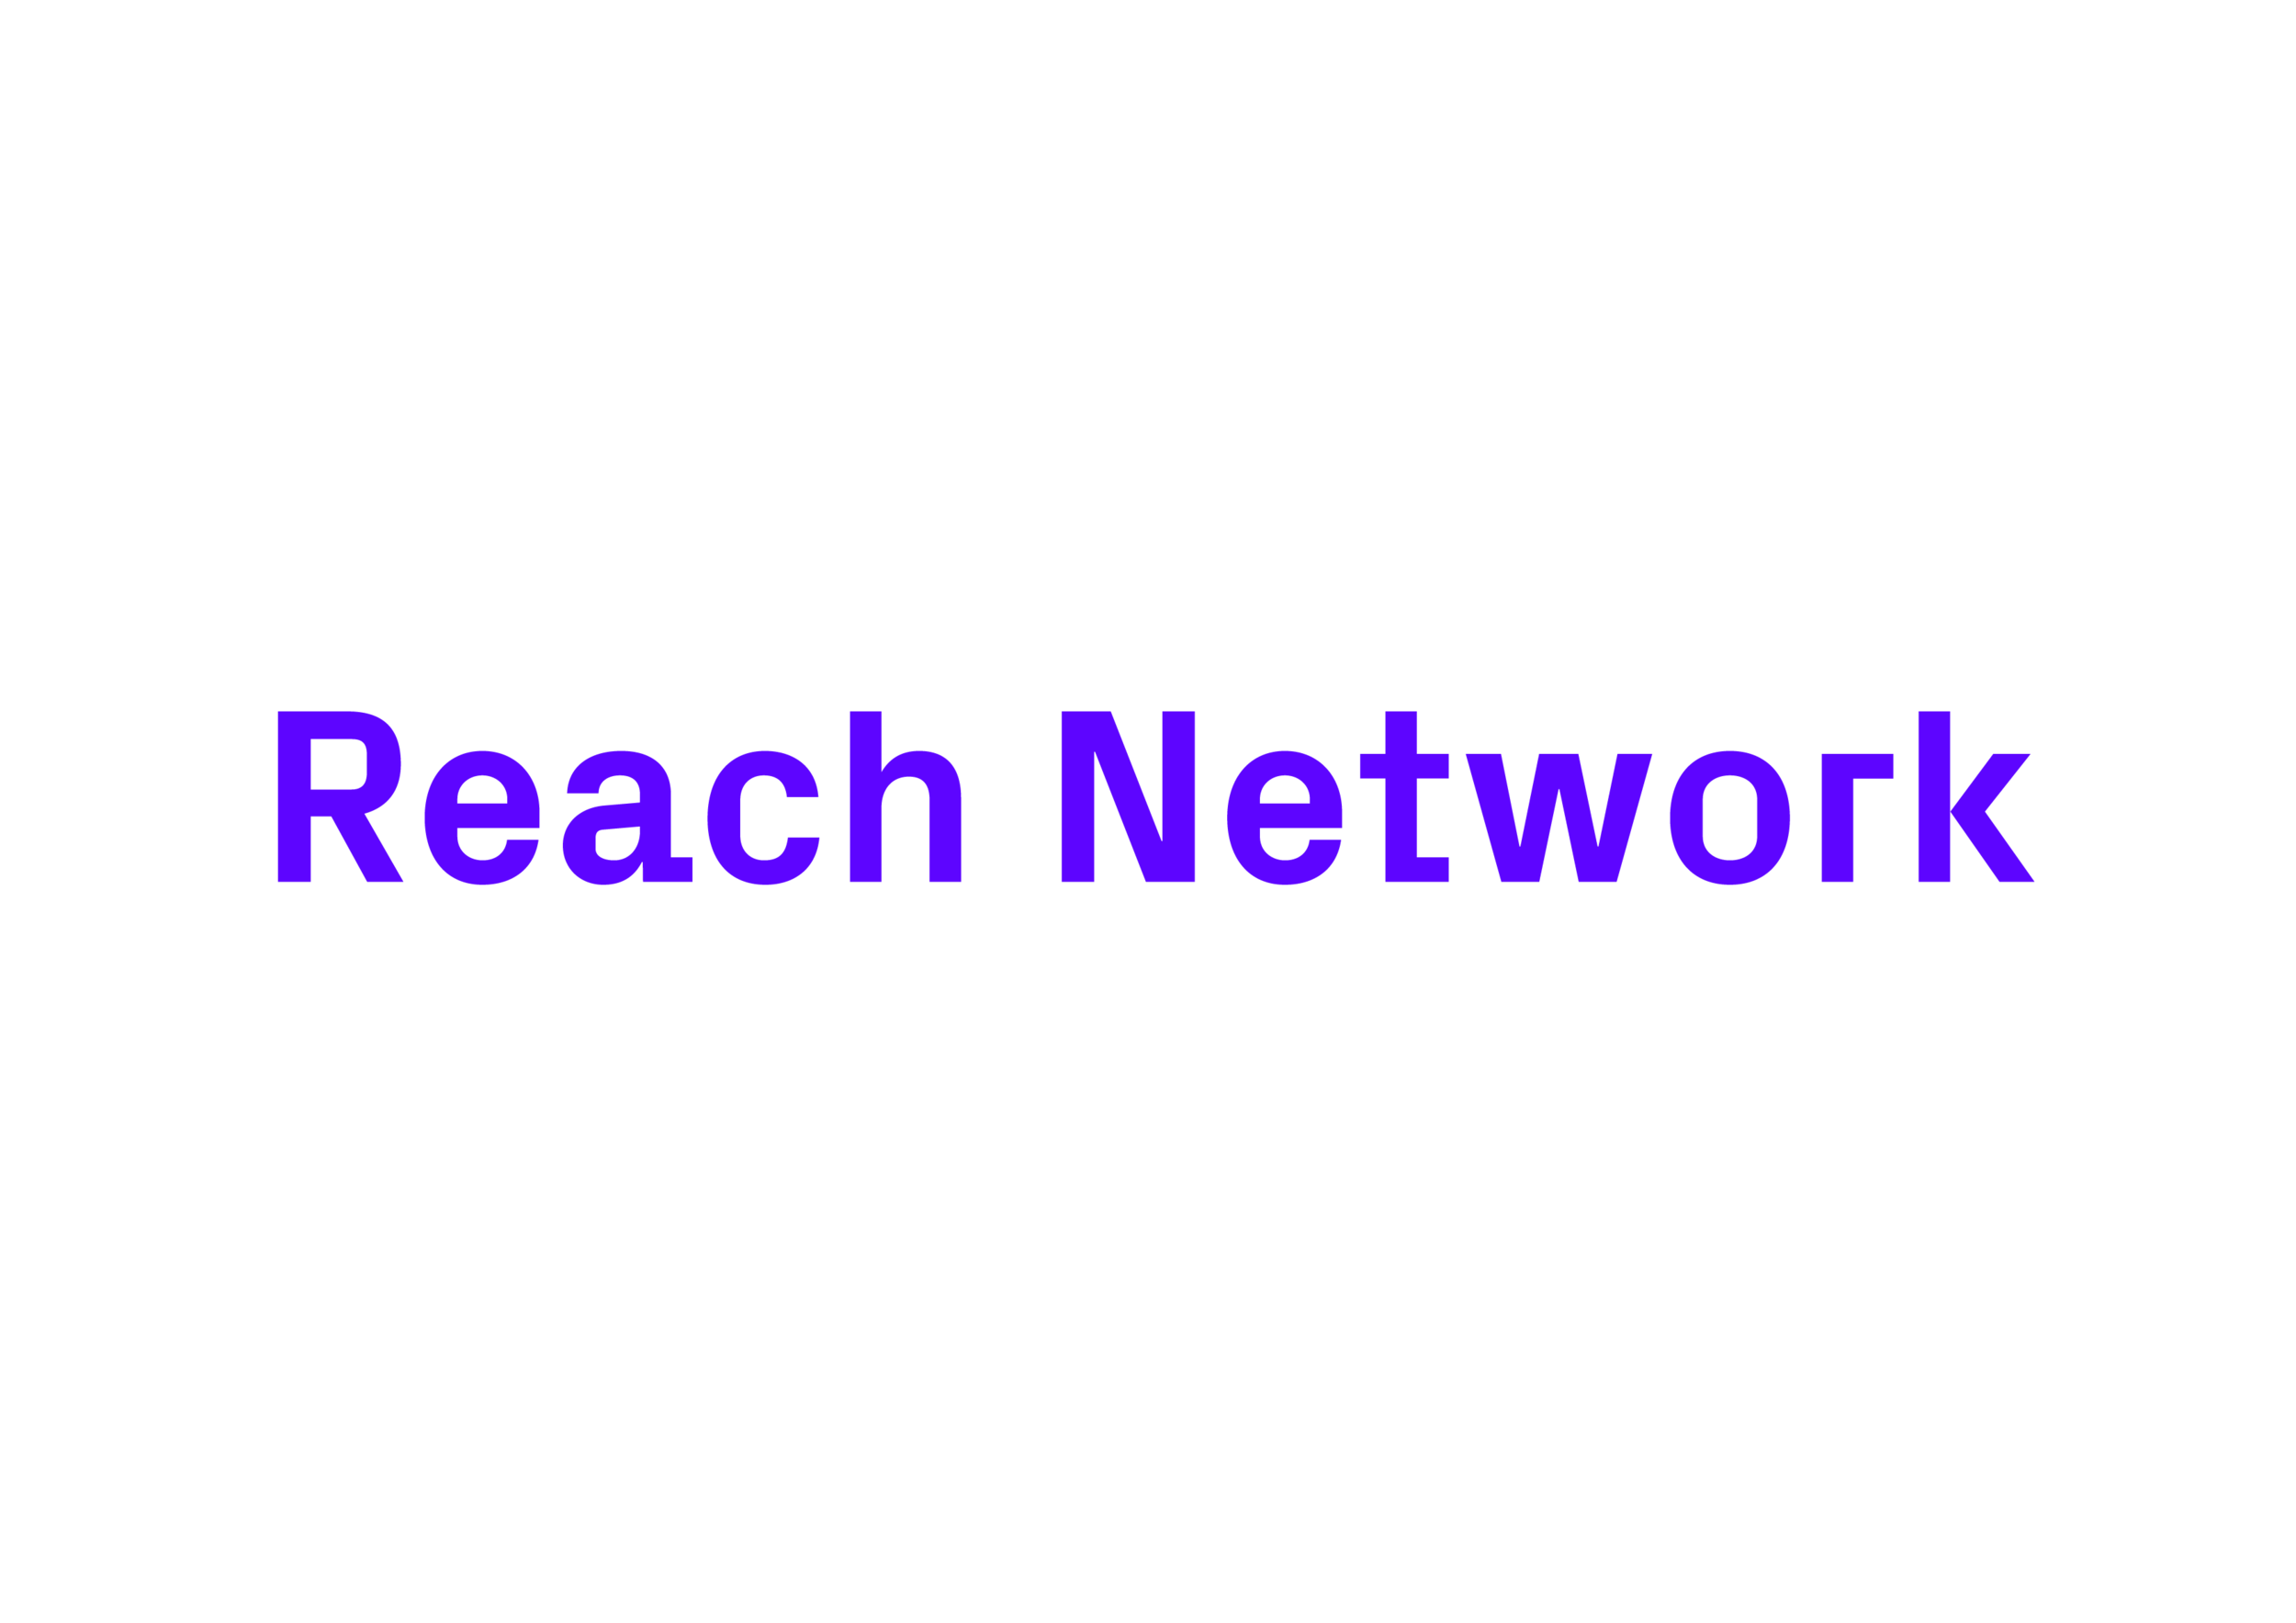 Reachnetwork logo_purple-01 (1).png